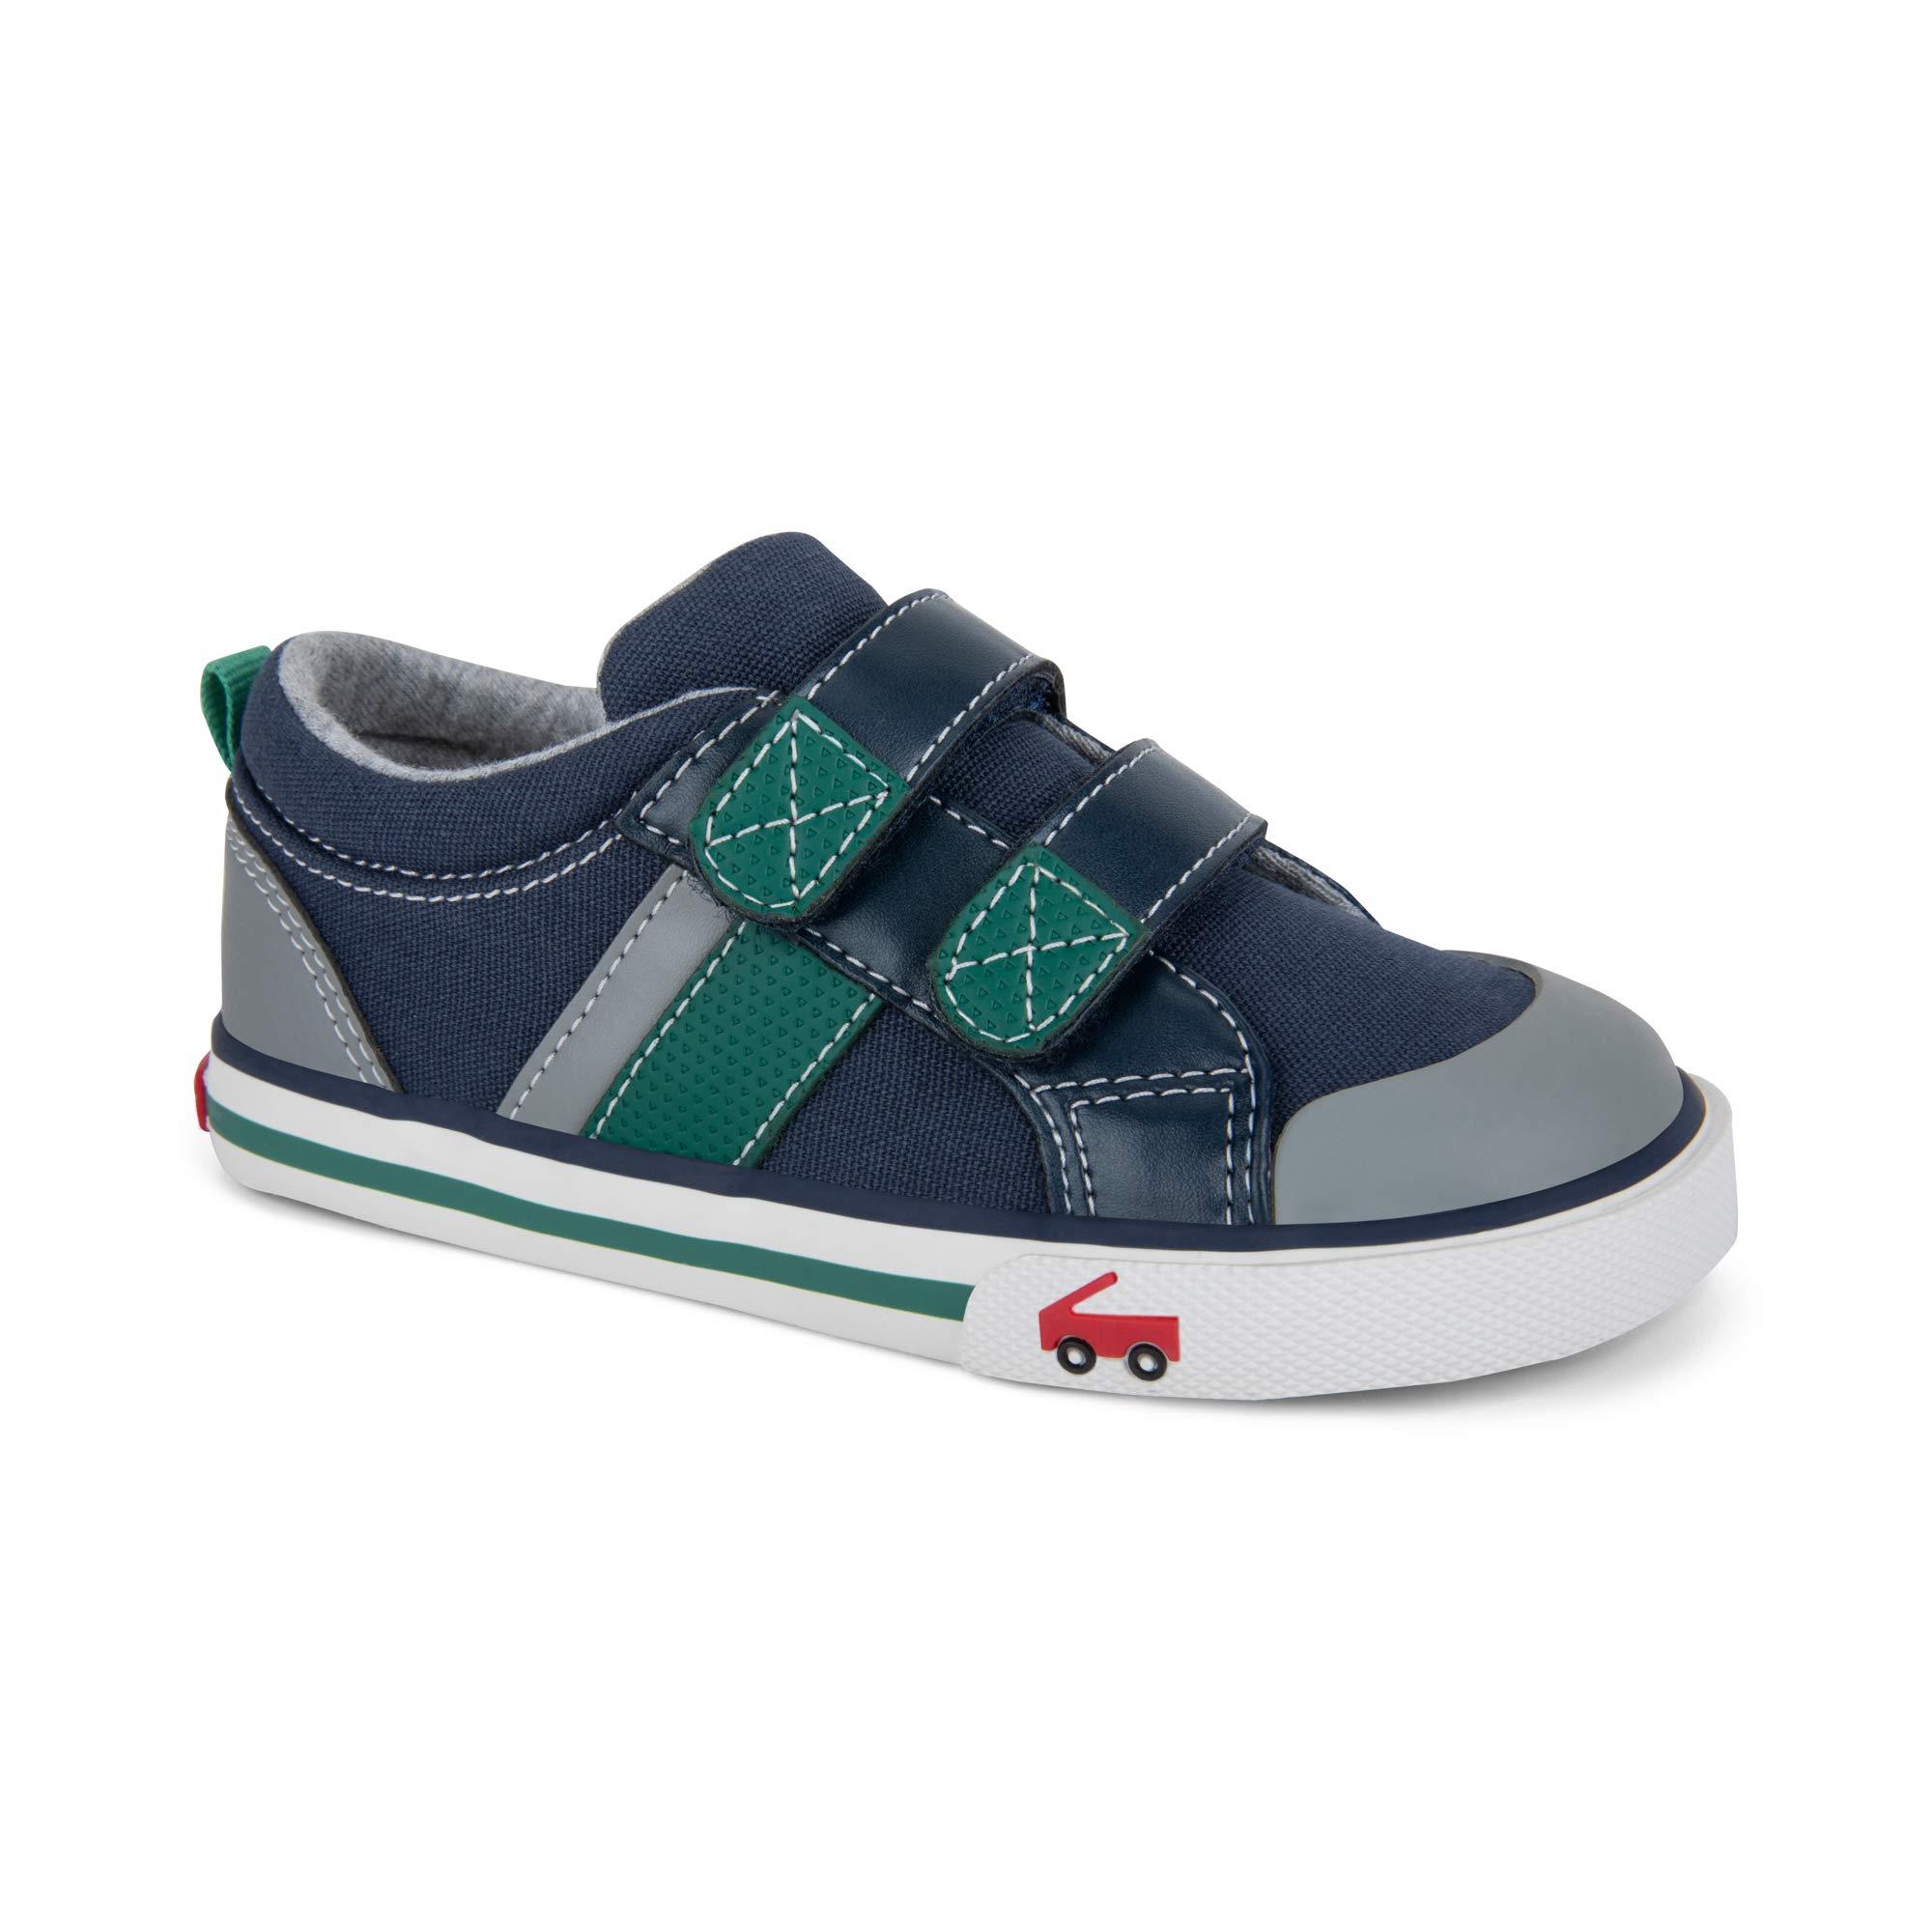 See Kai Run Boys' Russell Sneaker, Navy/Green, 7 M US Toddler